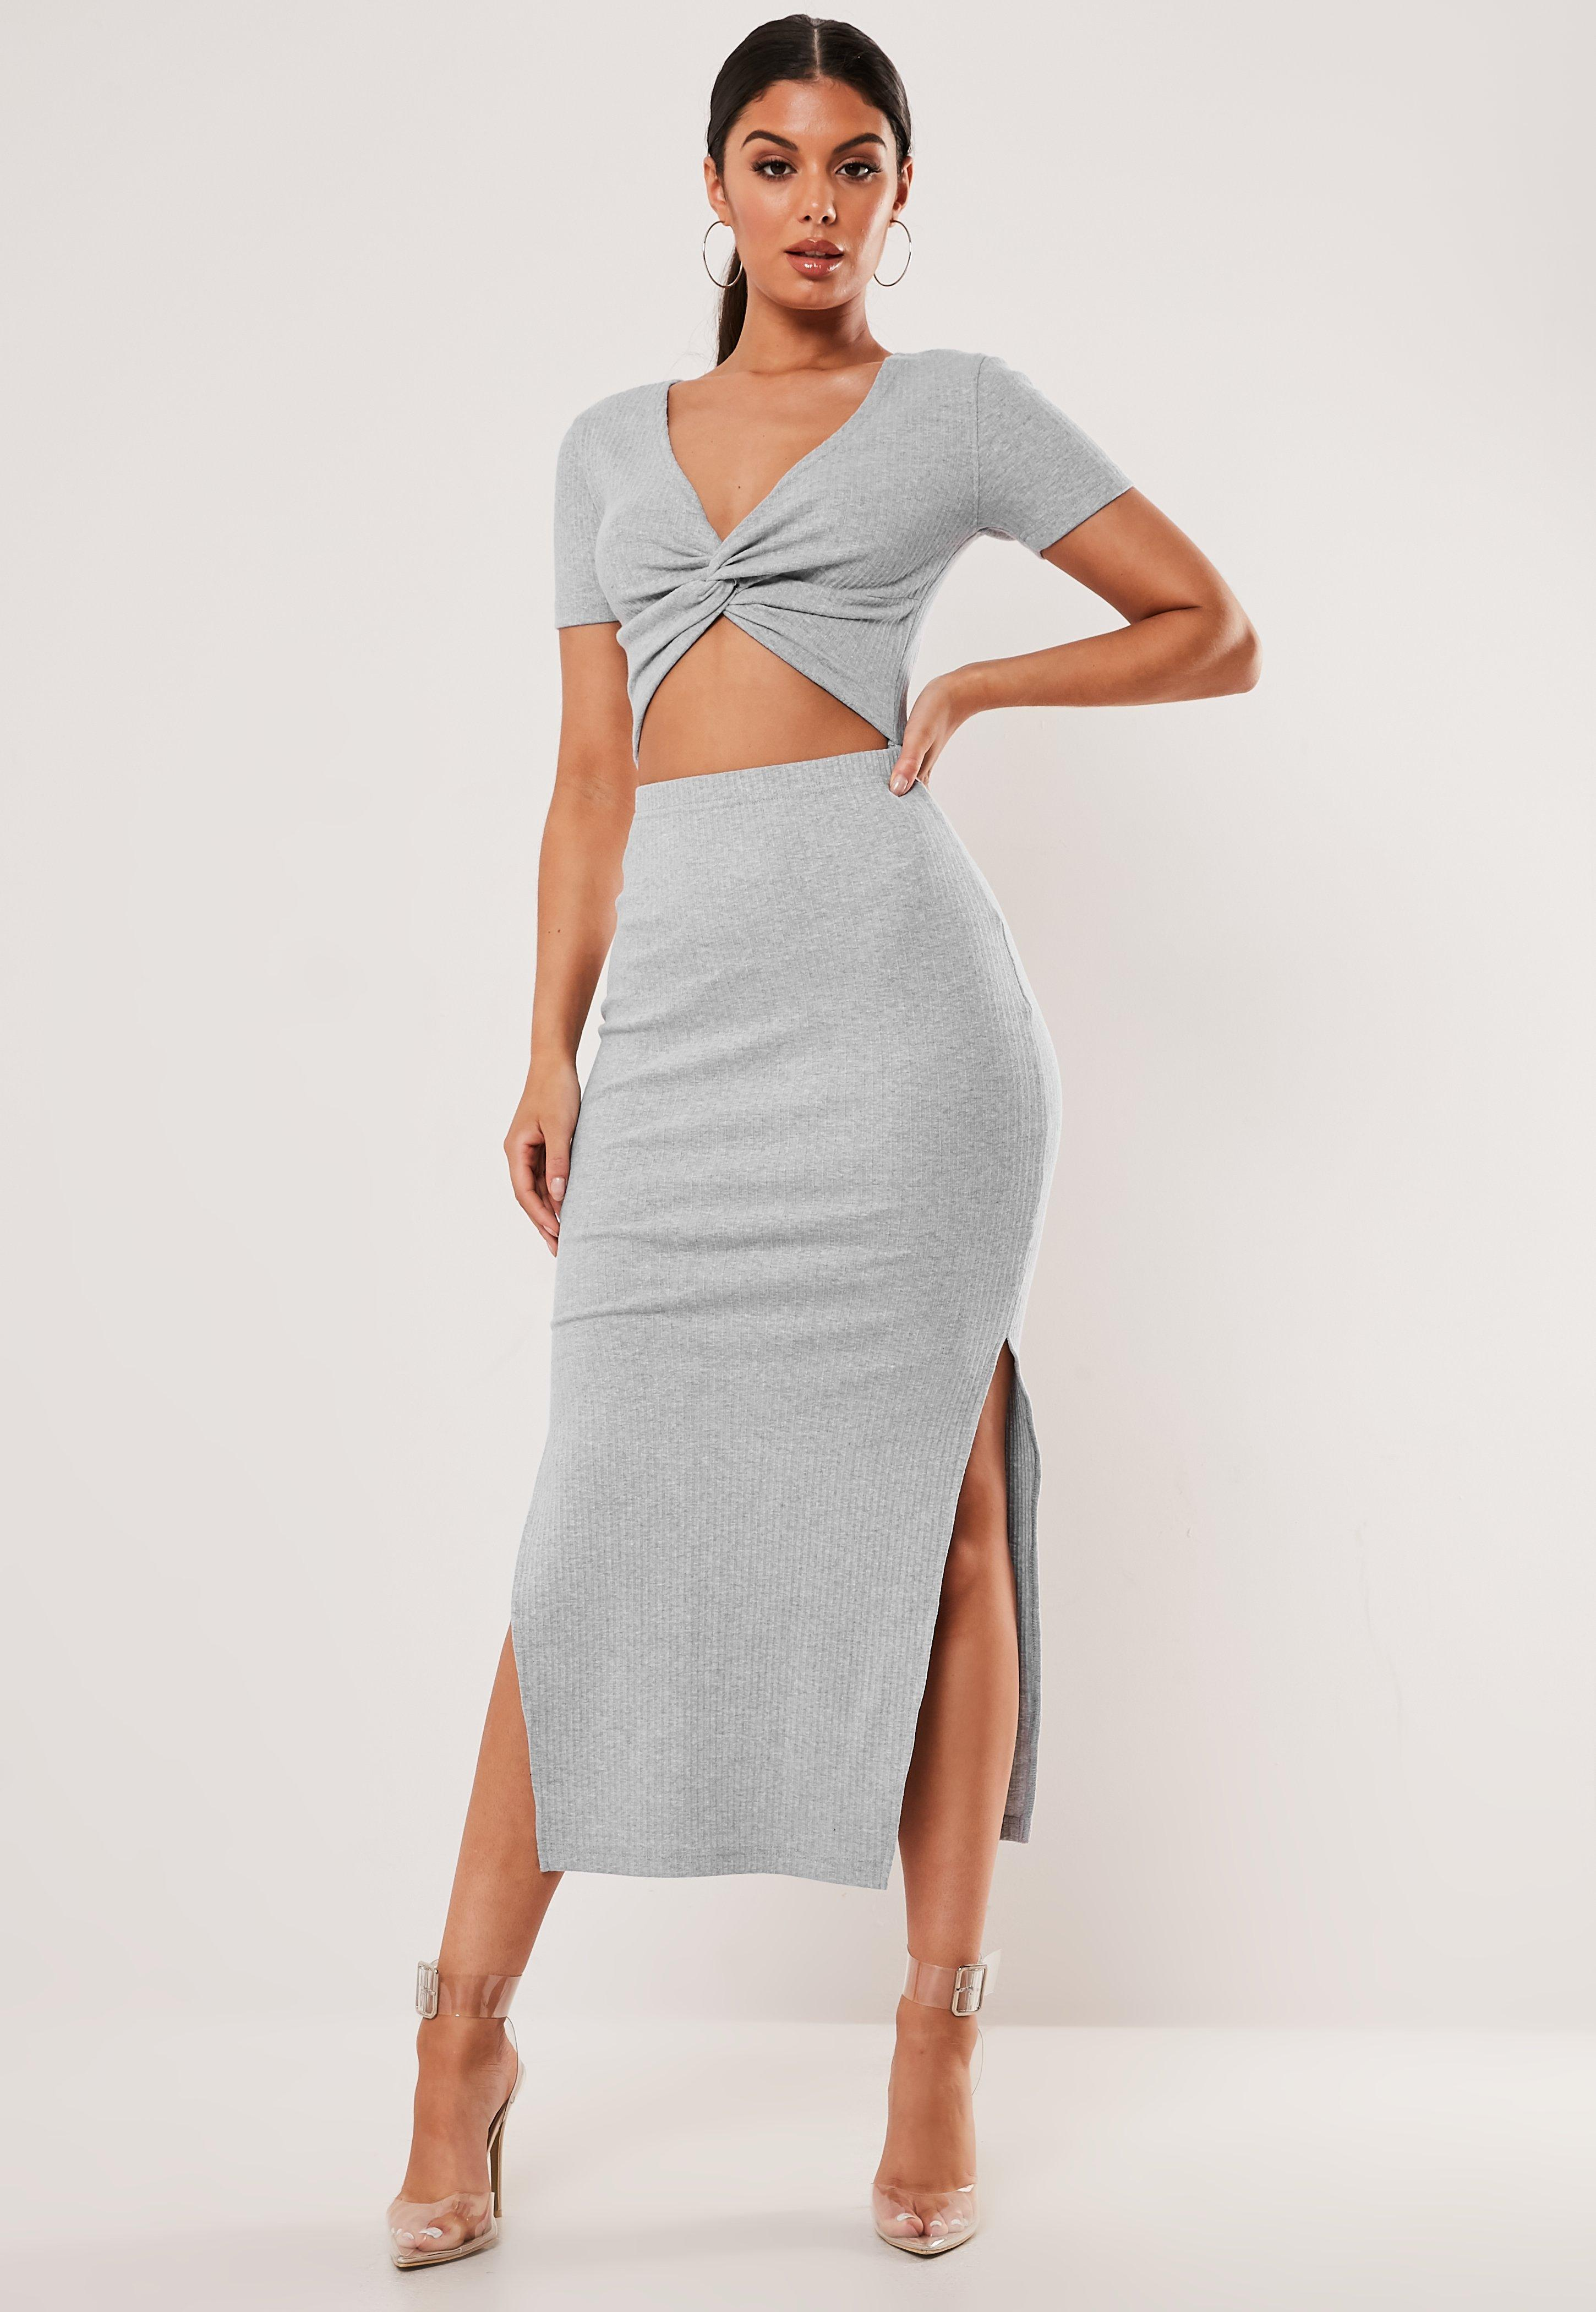 7d51ce2aeb Cut Out Dresses   Cut Out Side Dresses - Missguided